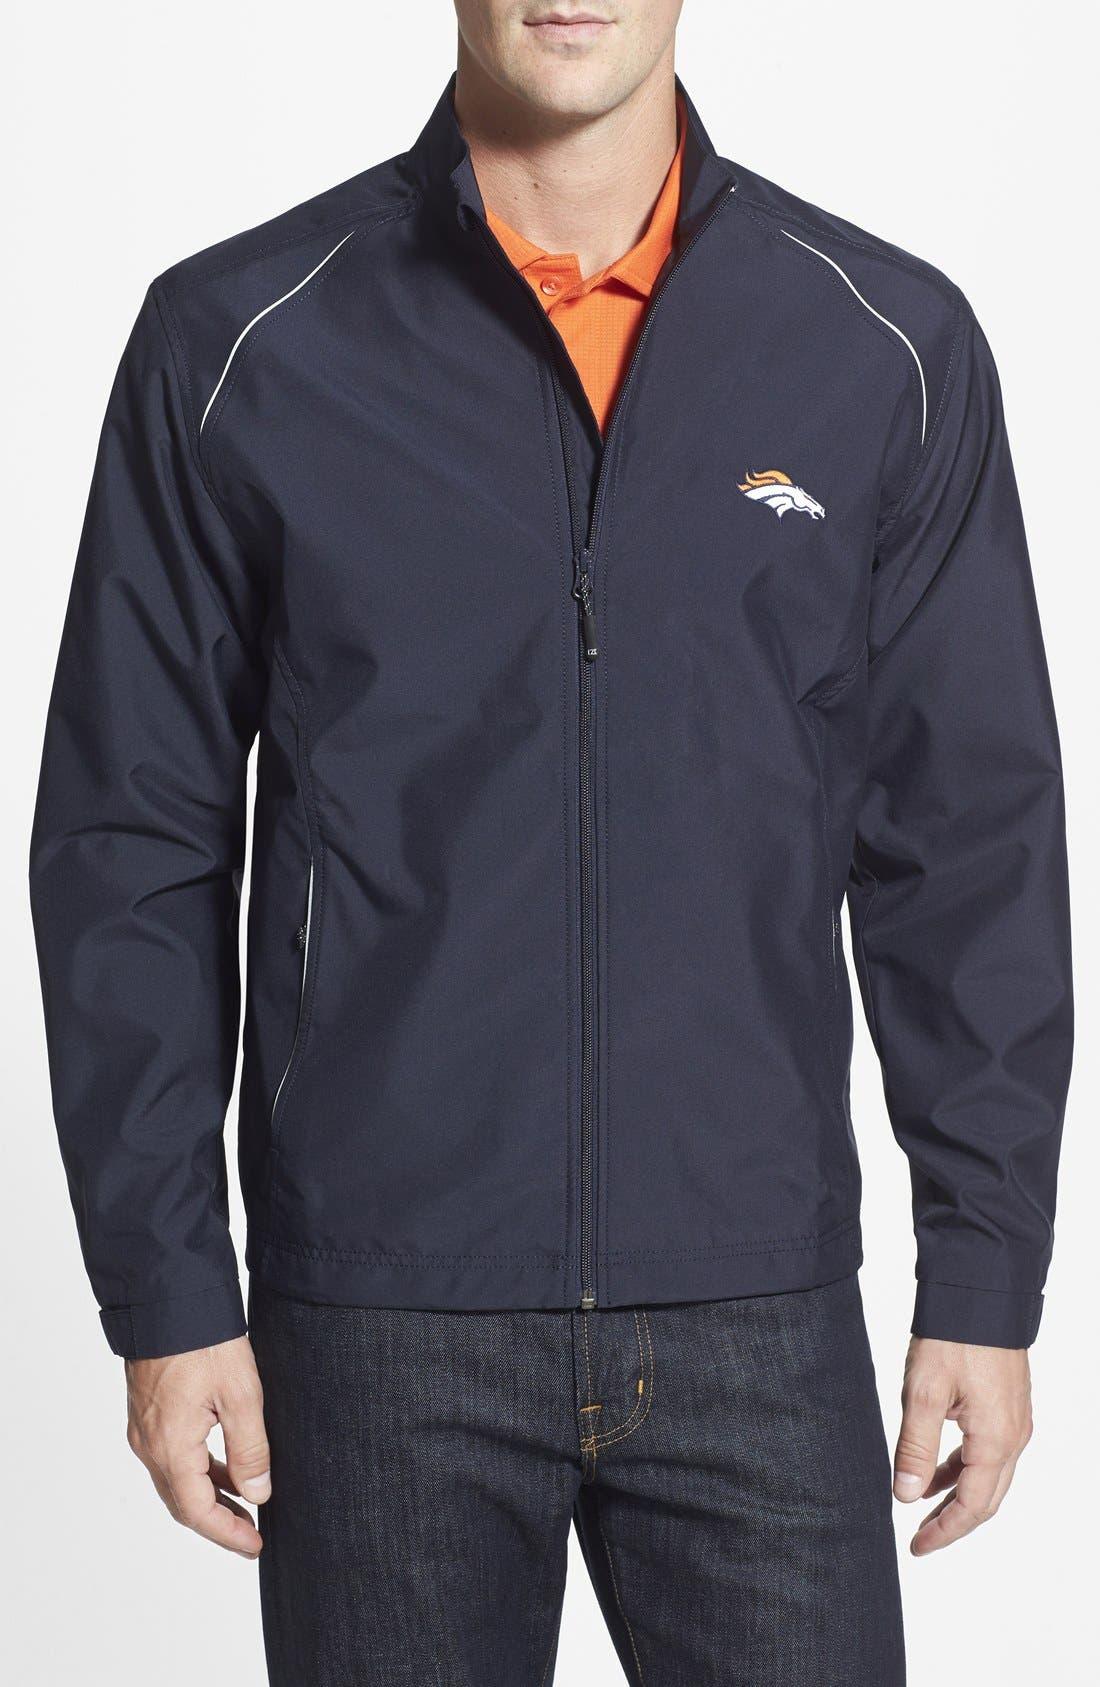 CUTTER & BUCK Denver Broncos - Beacon WeatherTec Wind & Water Resistant Jacket, Main, color, 420